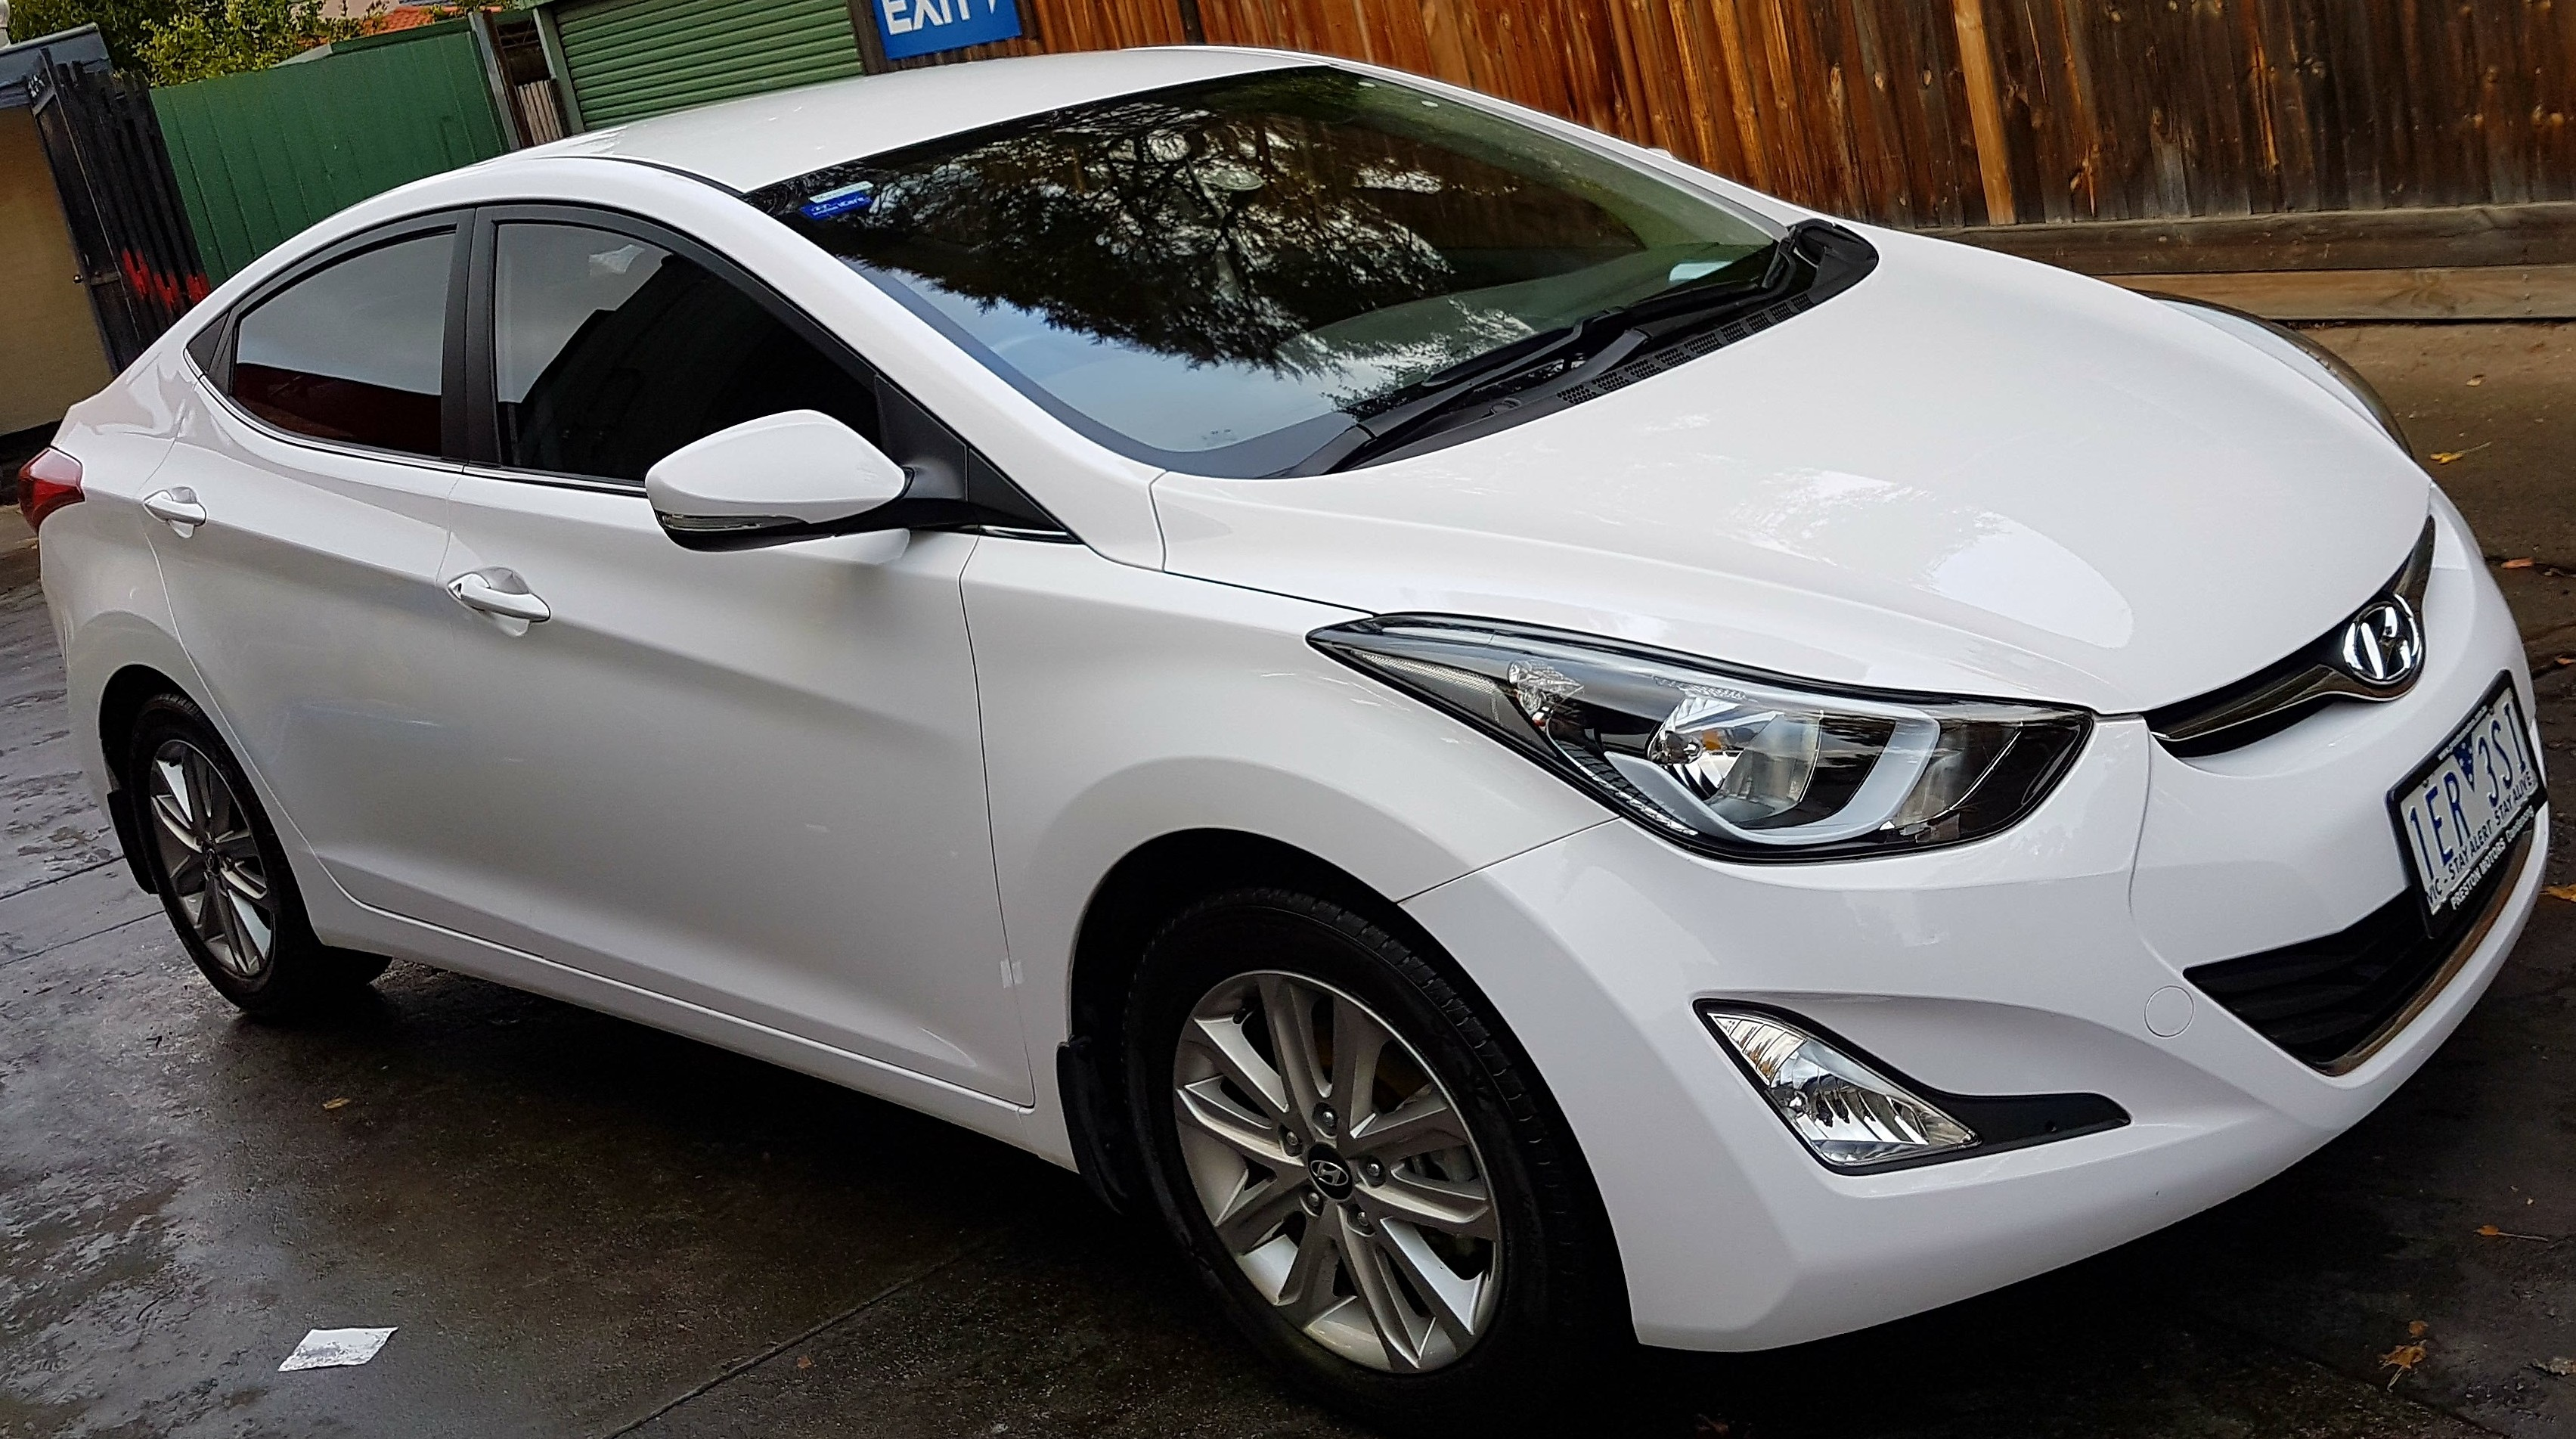 Picture of Sandeep's 2015 Hyundai Elantra SE